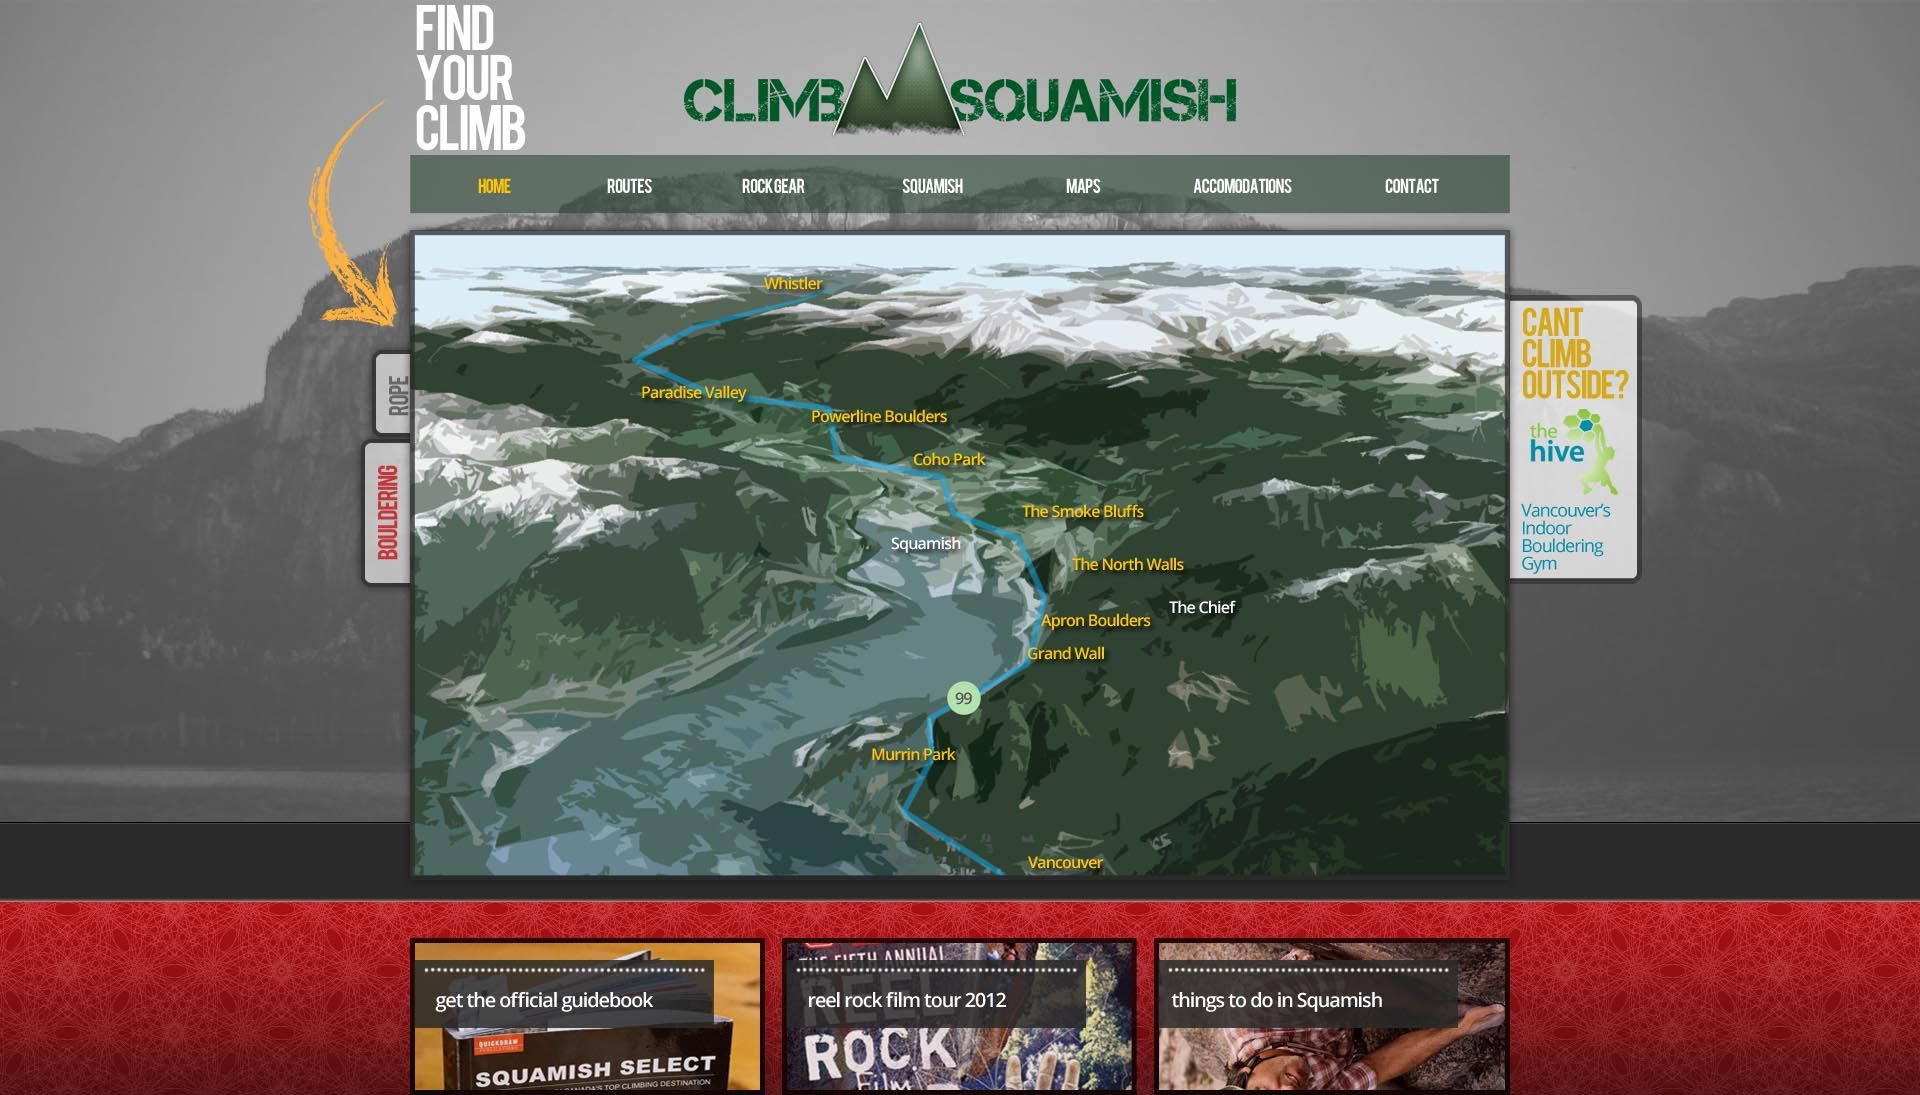 Climb Squamish Website Design And Mockup Www Yourdesignhere Ca Vancouver Graphic Design Web Print Mobile Devel Website Design Your Design Guide Book